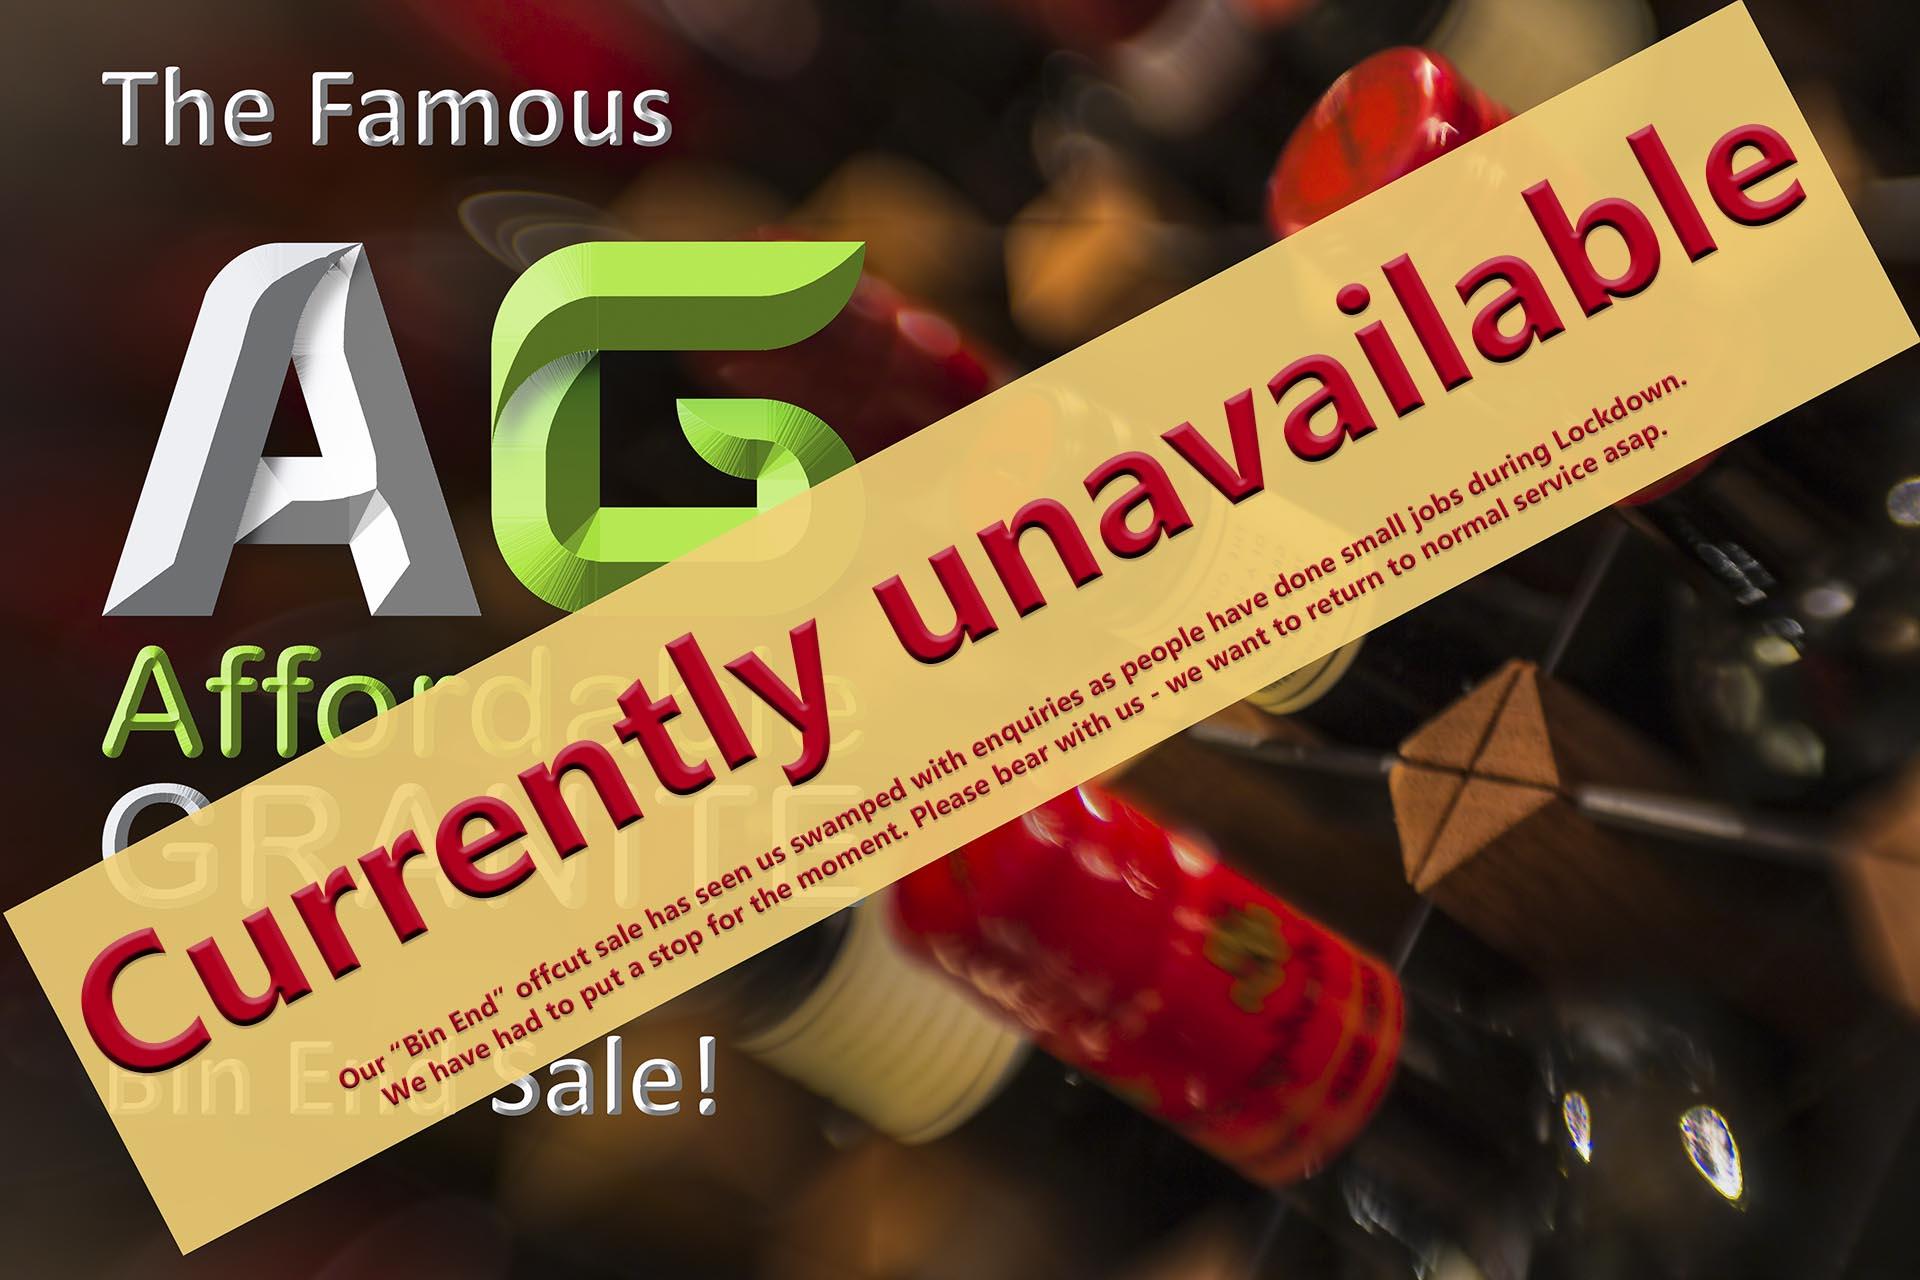 no offcut availability